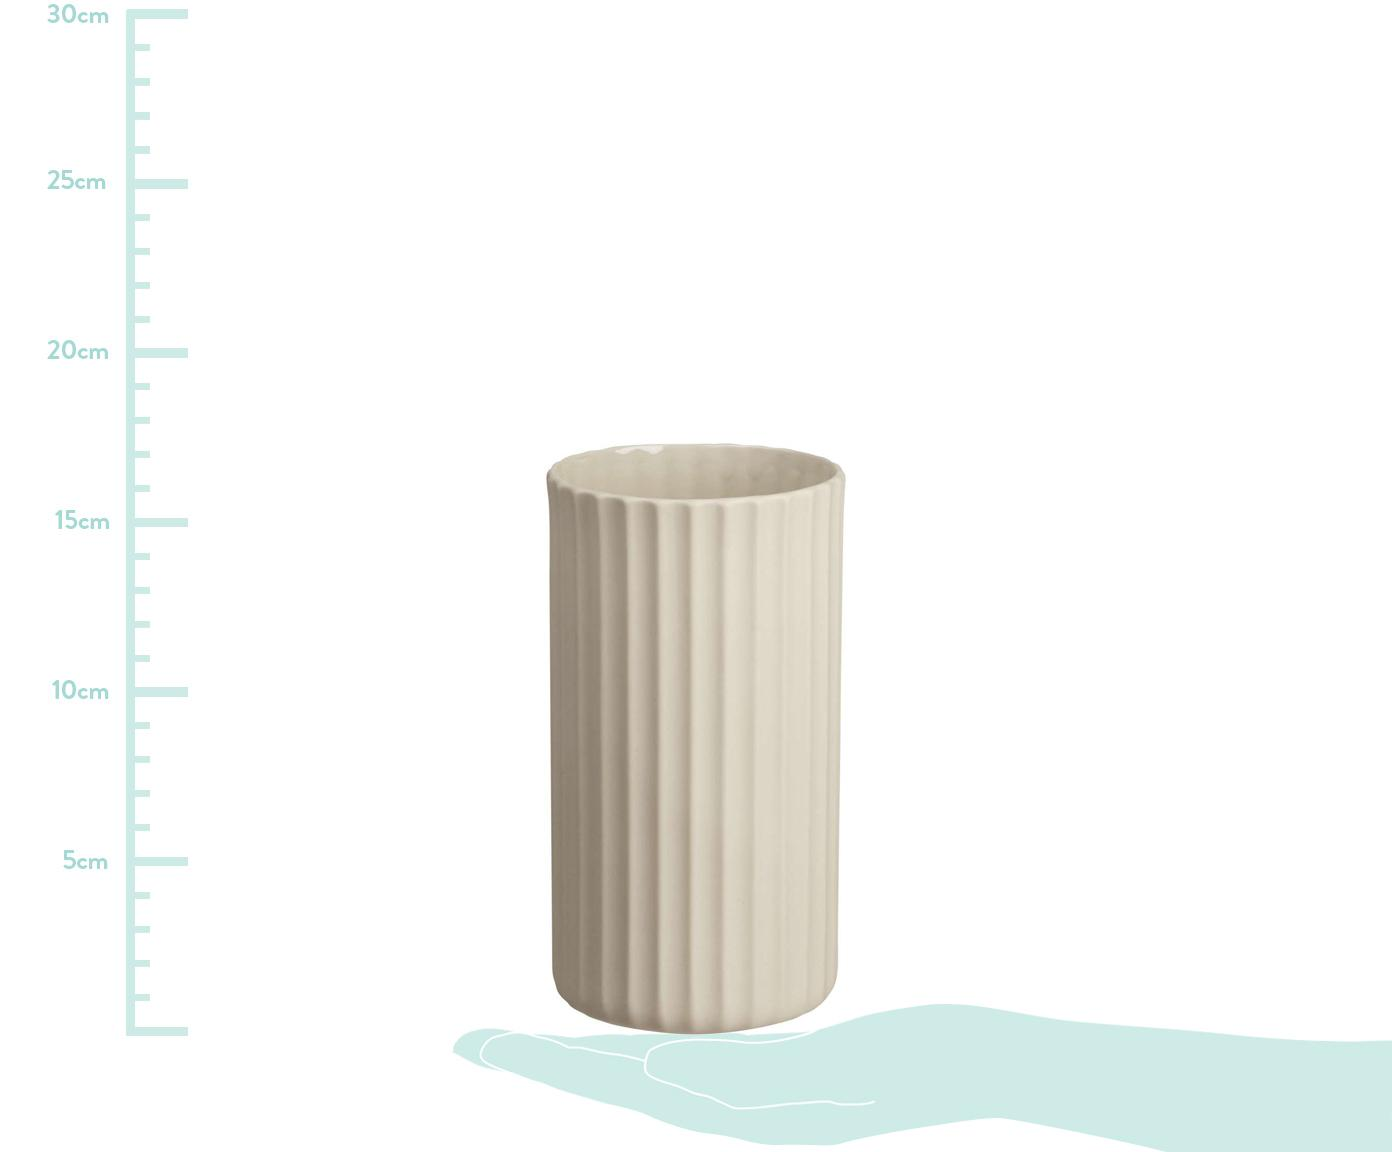 Handgefertigte Vase Yoko aus Porzellan, Porzellan, Beige, Ø 12 x H 24 cm